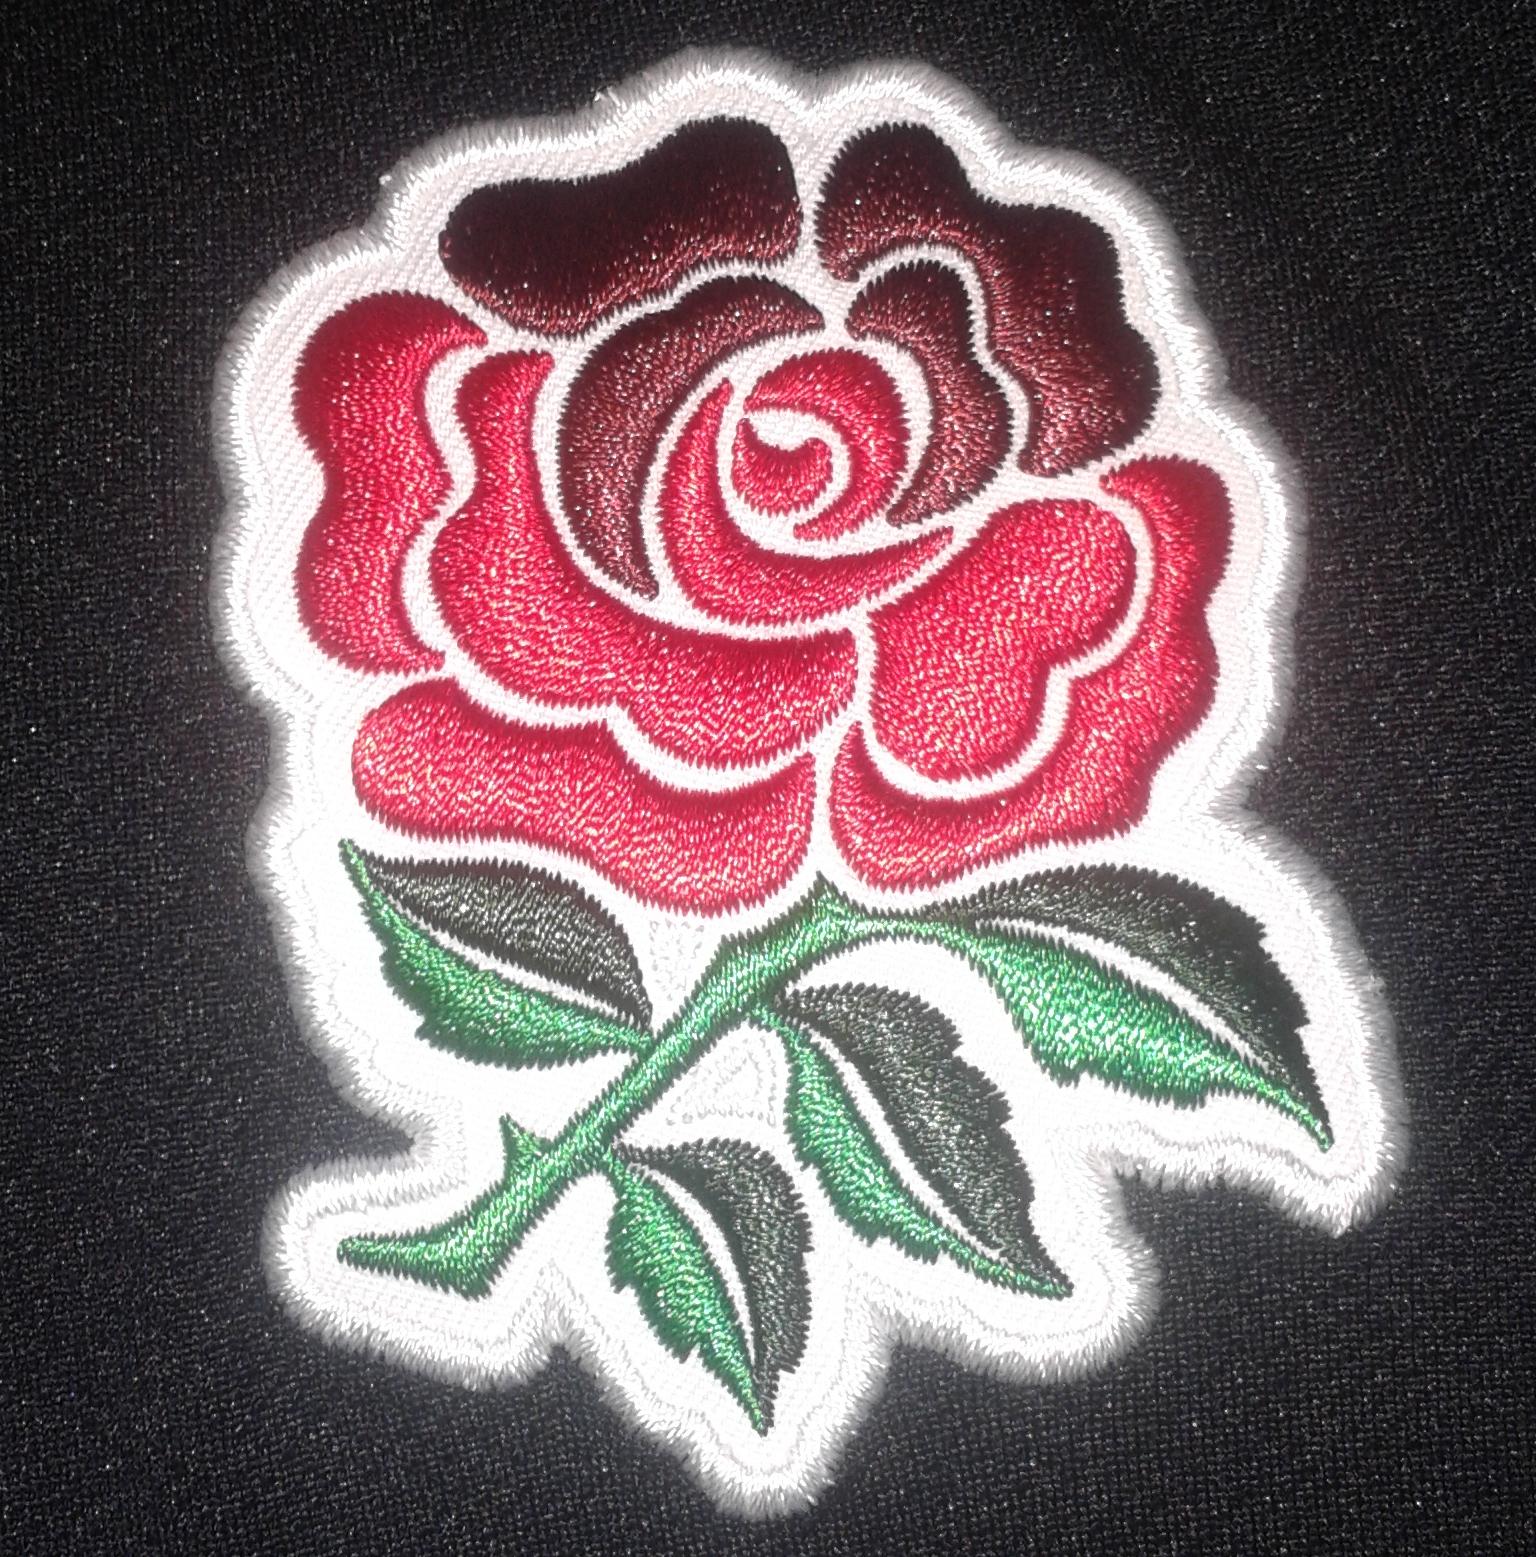 rugby england crest shirt black